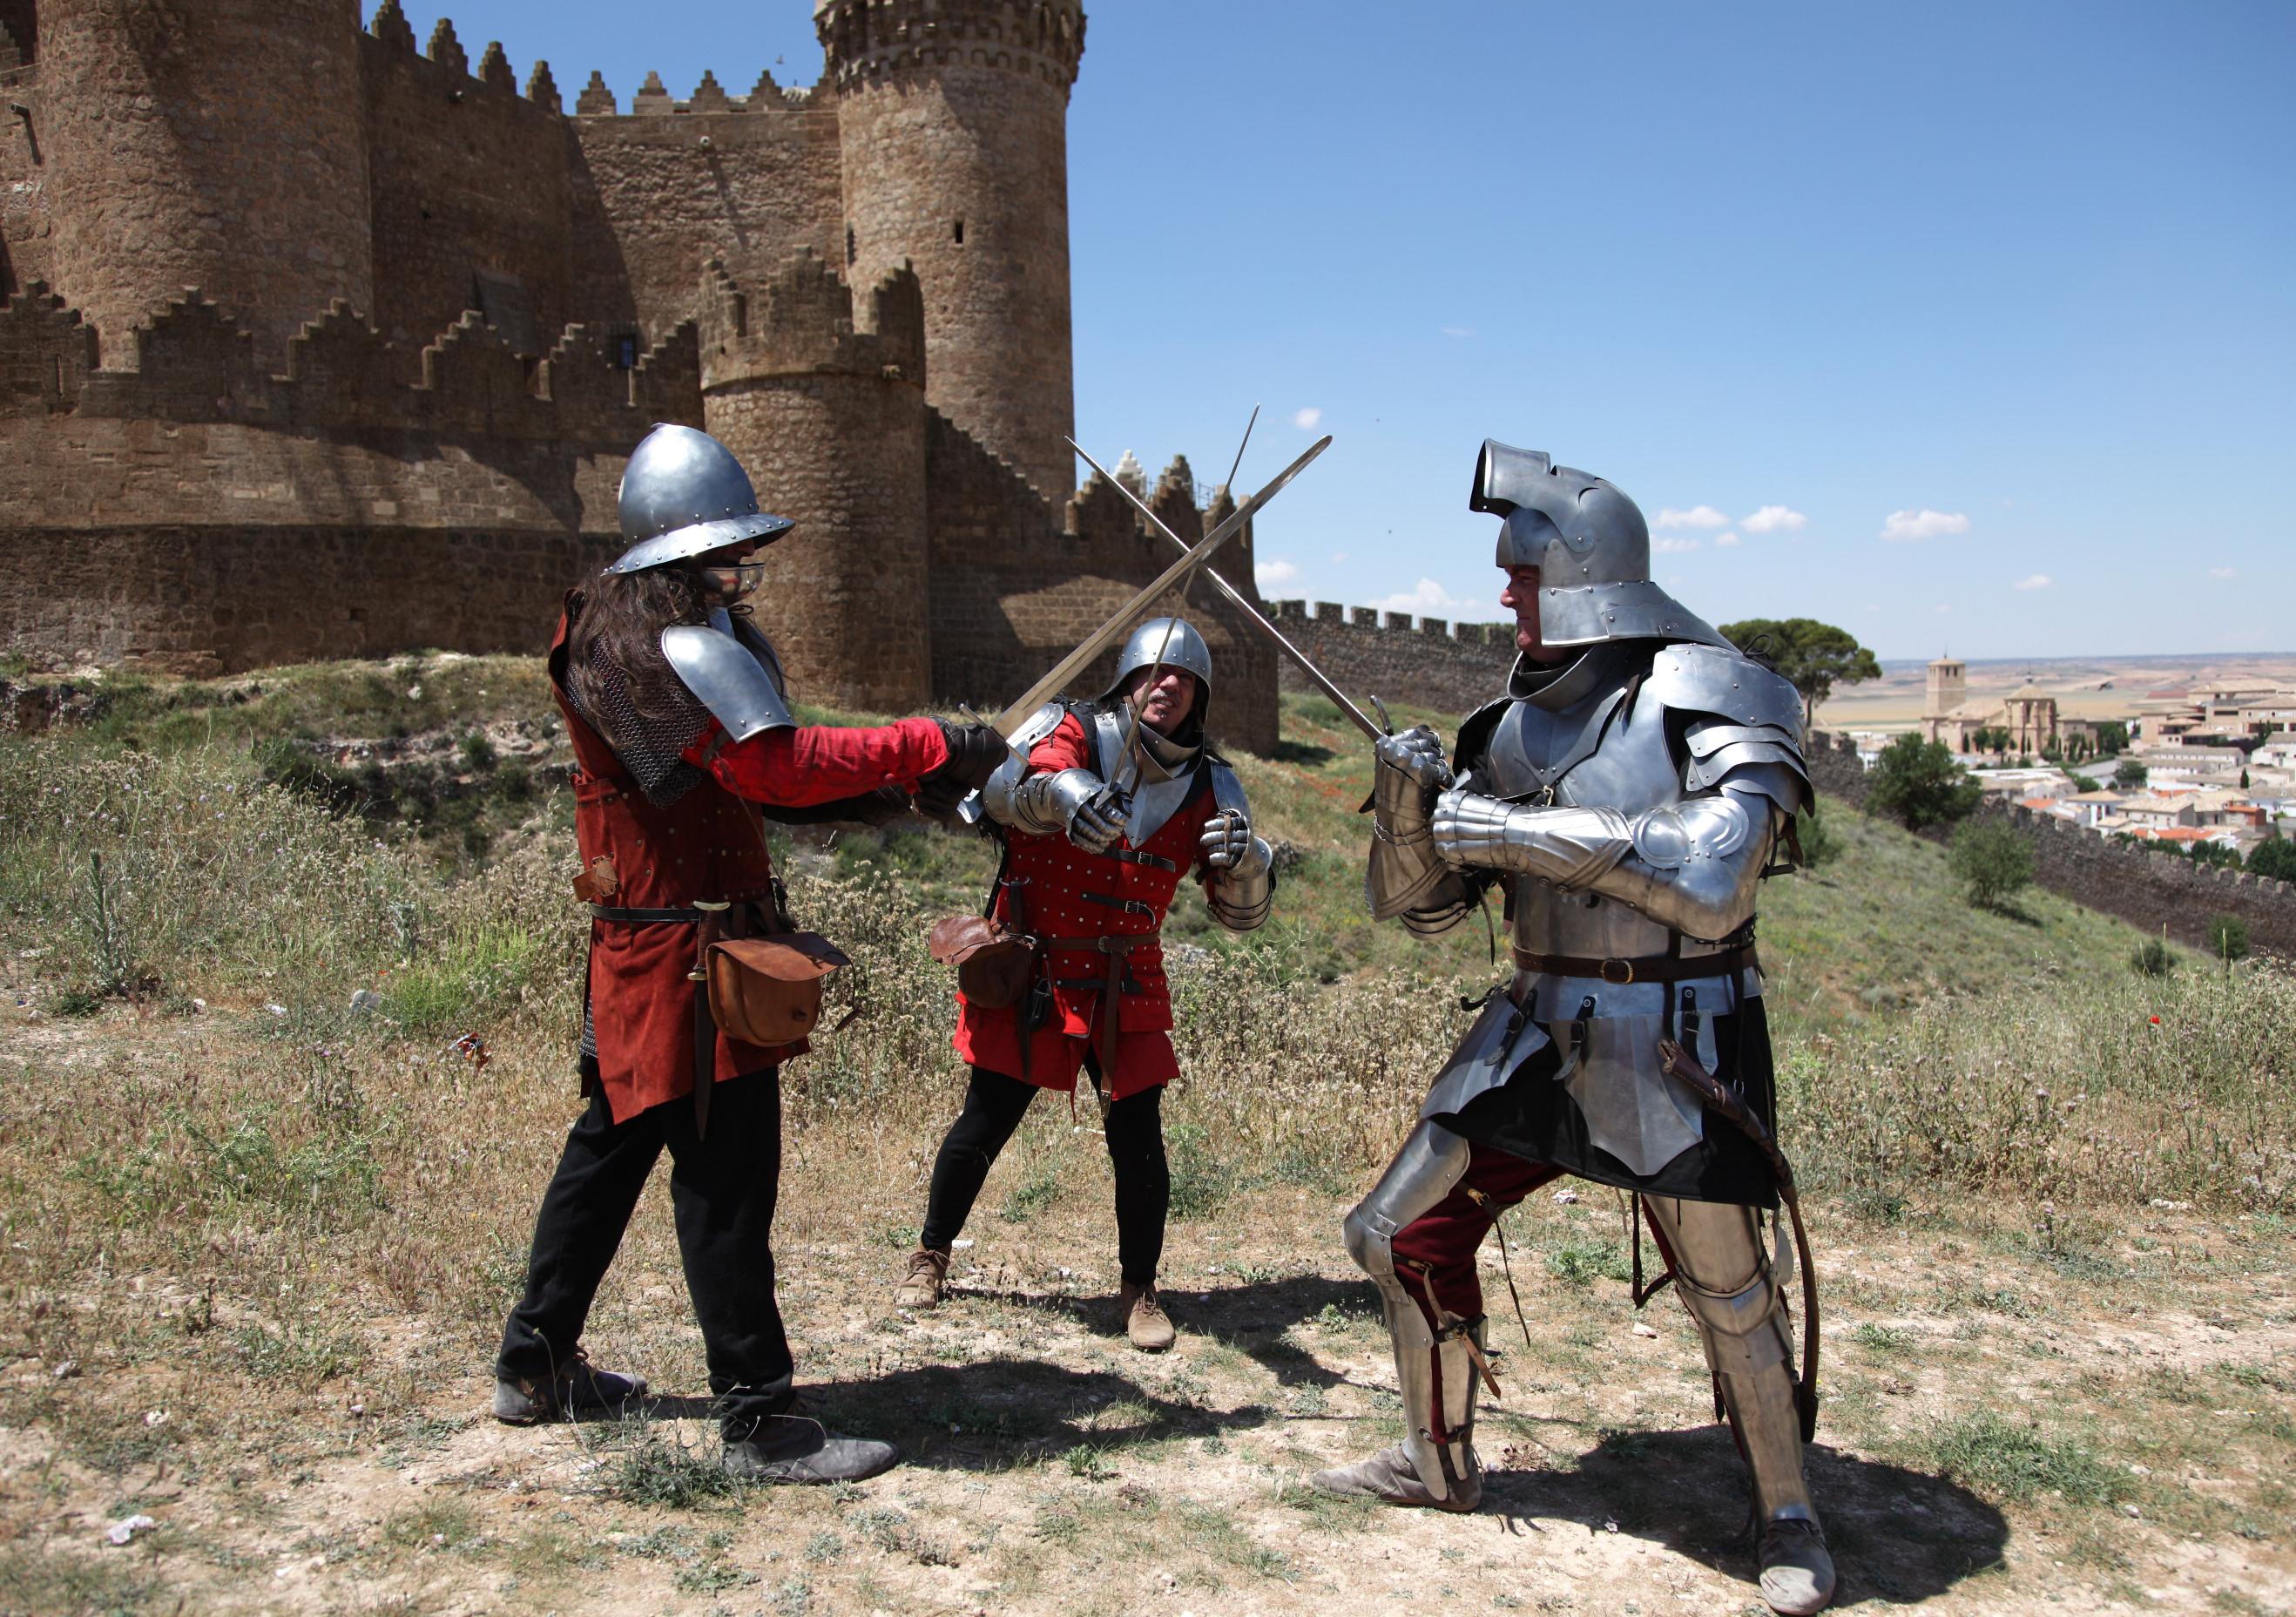 V Jornadas de Recreación Histórica con la Guerra de Sucesión Castellana (1475) Castillo de Belmonte UEEzXt